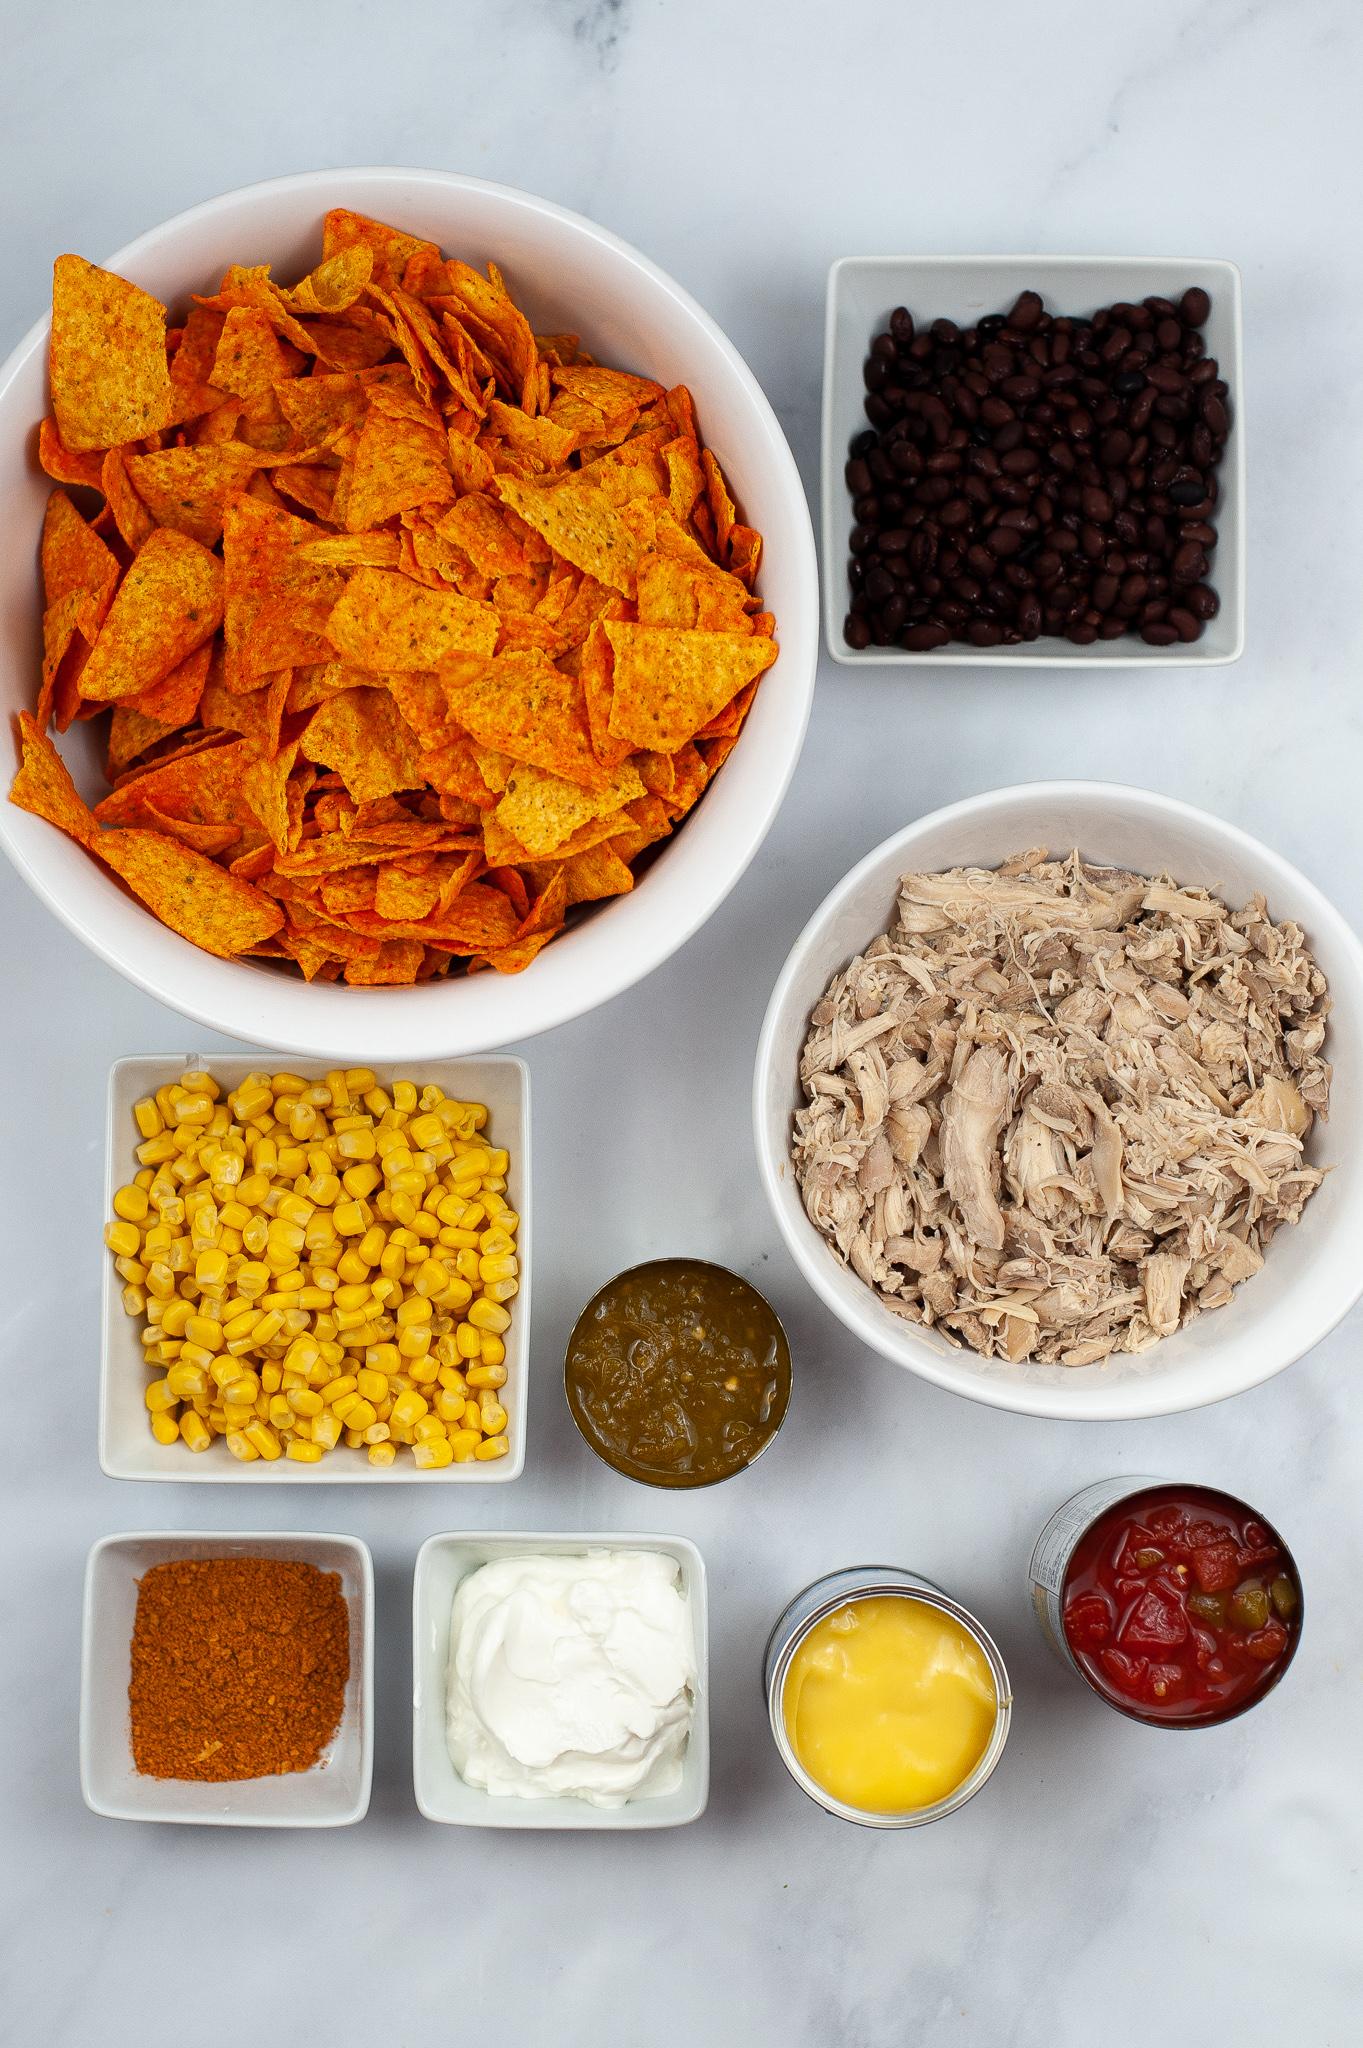 A bowl of doritos, corn, chicken and seasonings.